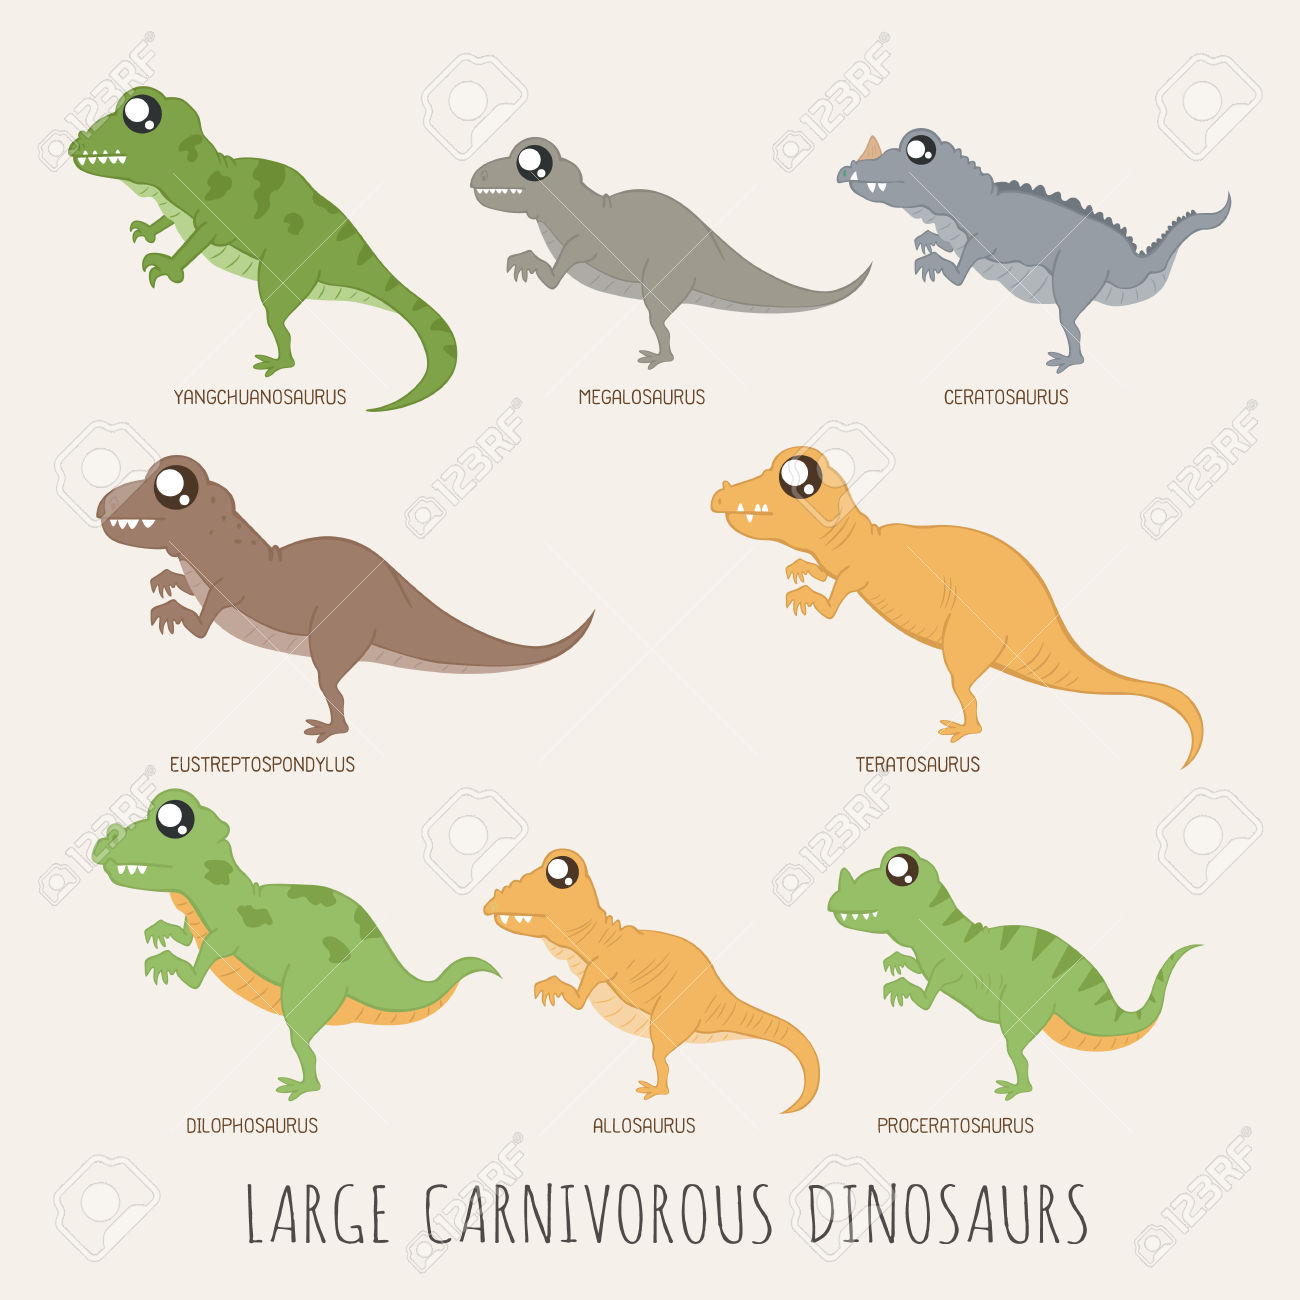 Set Of Large Carnivorous Dinosaurs Royalty Free Cliparts, Vectors.